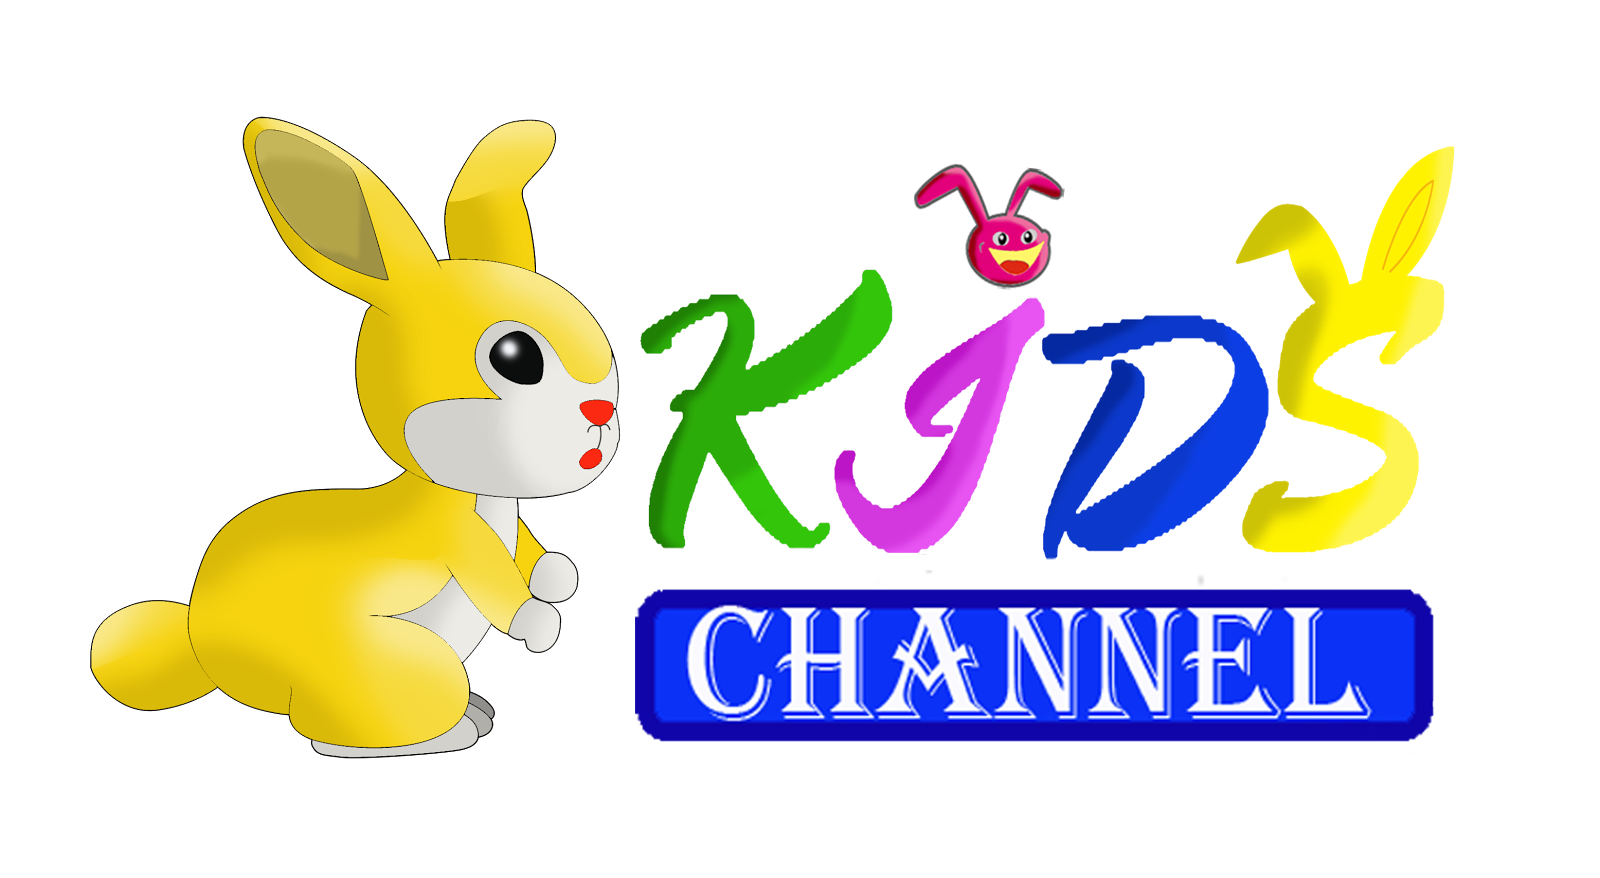 Rabbit kids channel